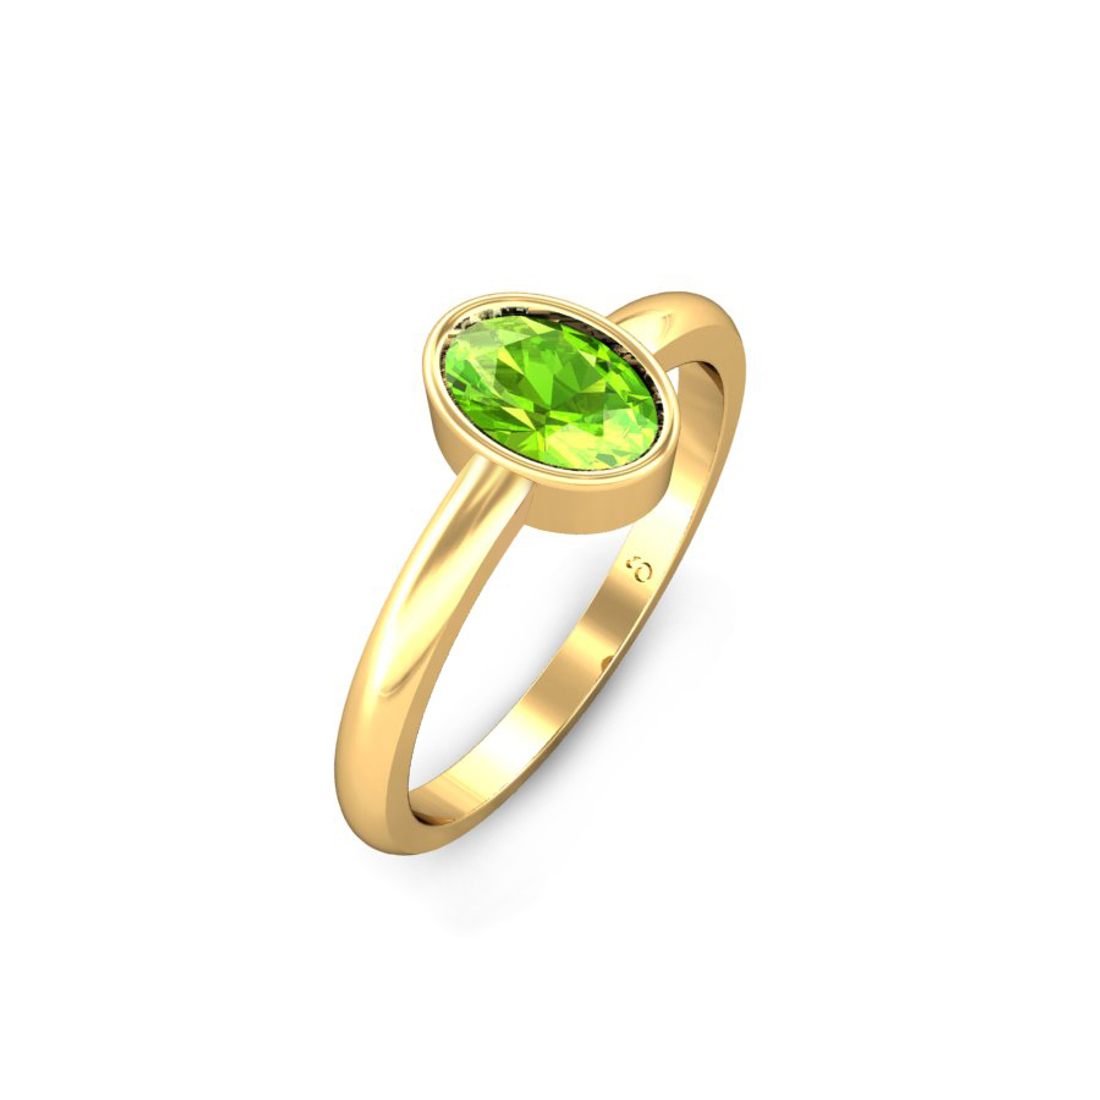 Jewel samarth 18k(750) BIS Hallmark Yellow Gold Akira Peridot Ring (CGL Certified)